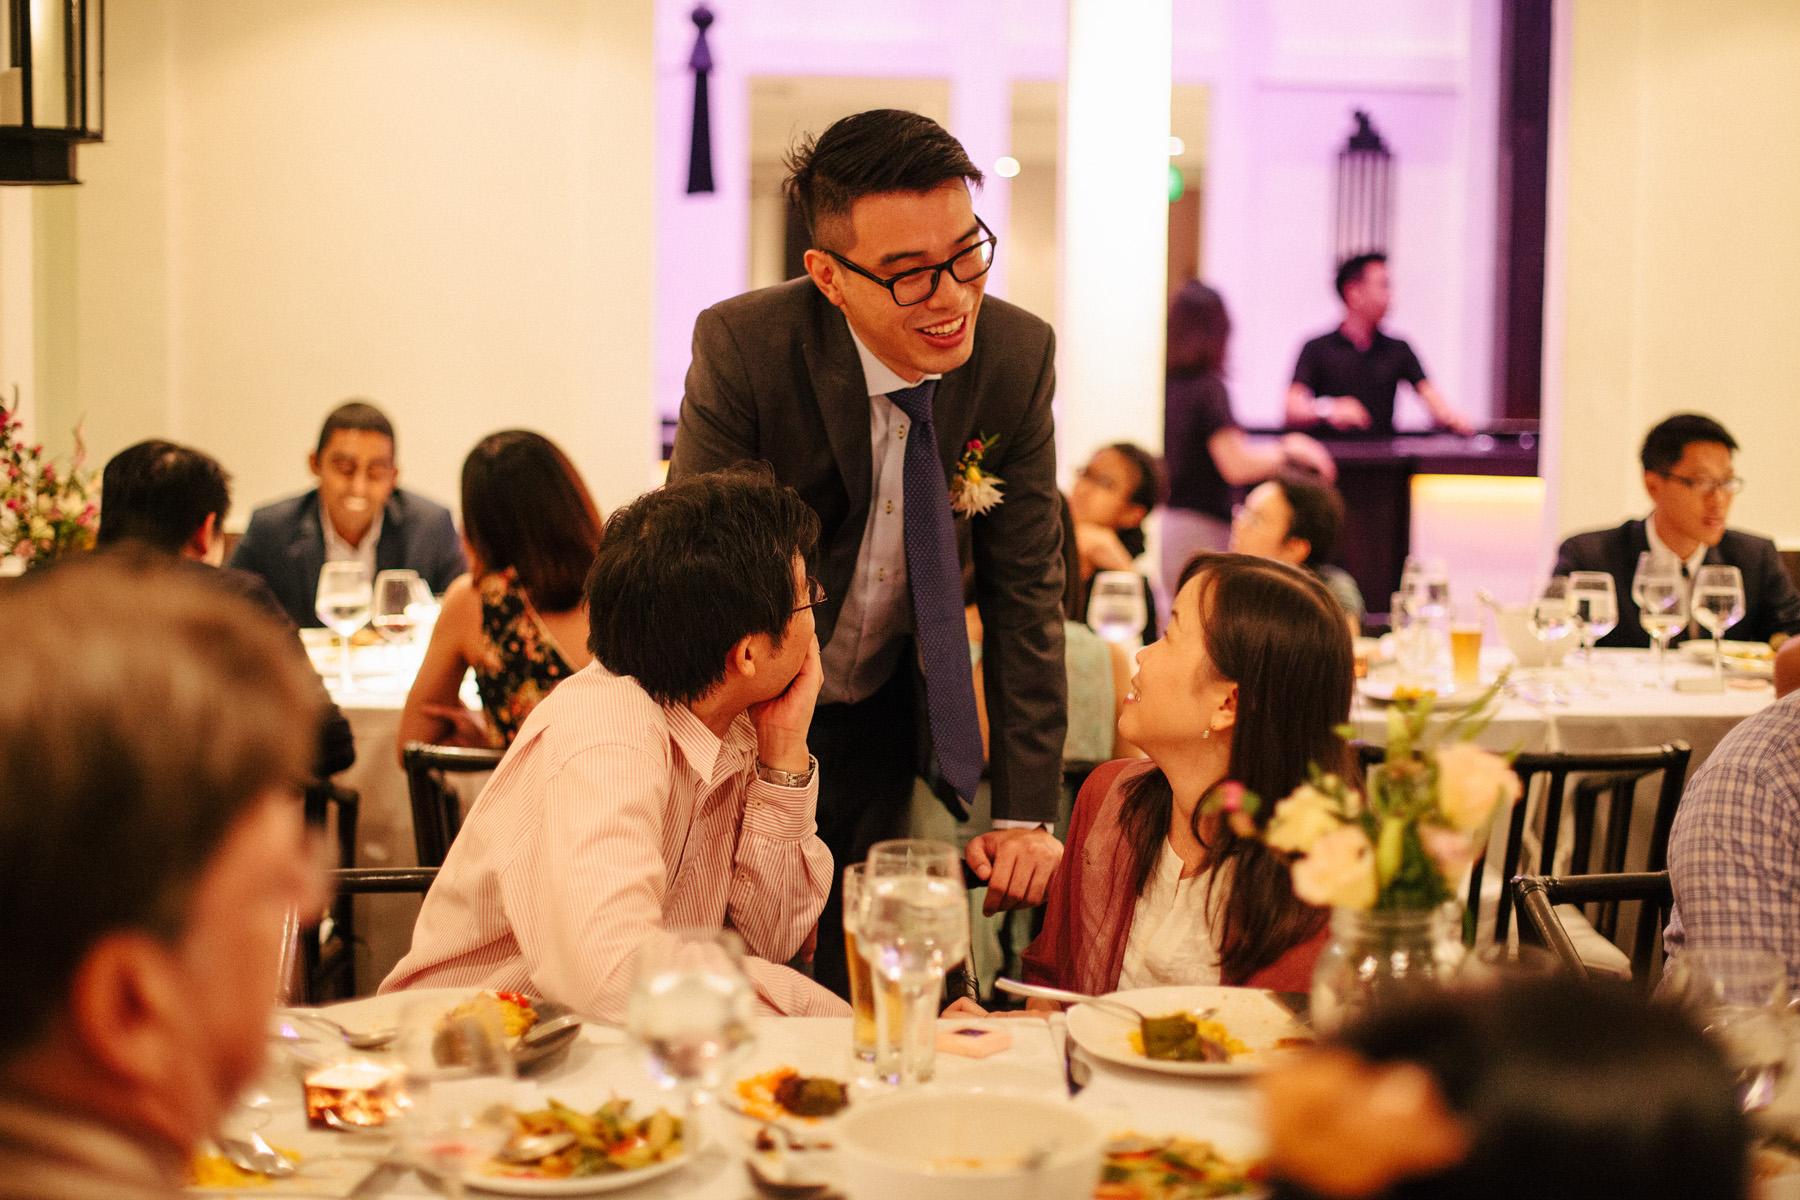 singapore-wedding-travel-photographer-faith-alvin-wedding-wmt-51.jpg